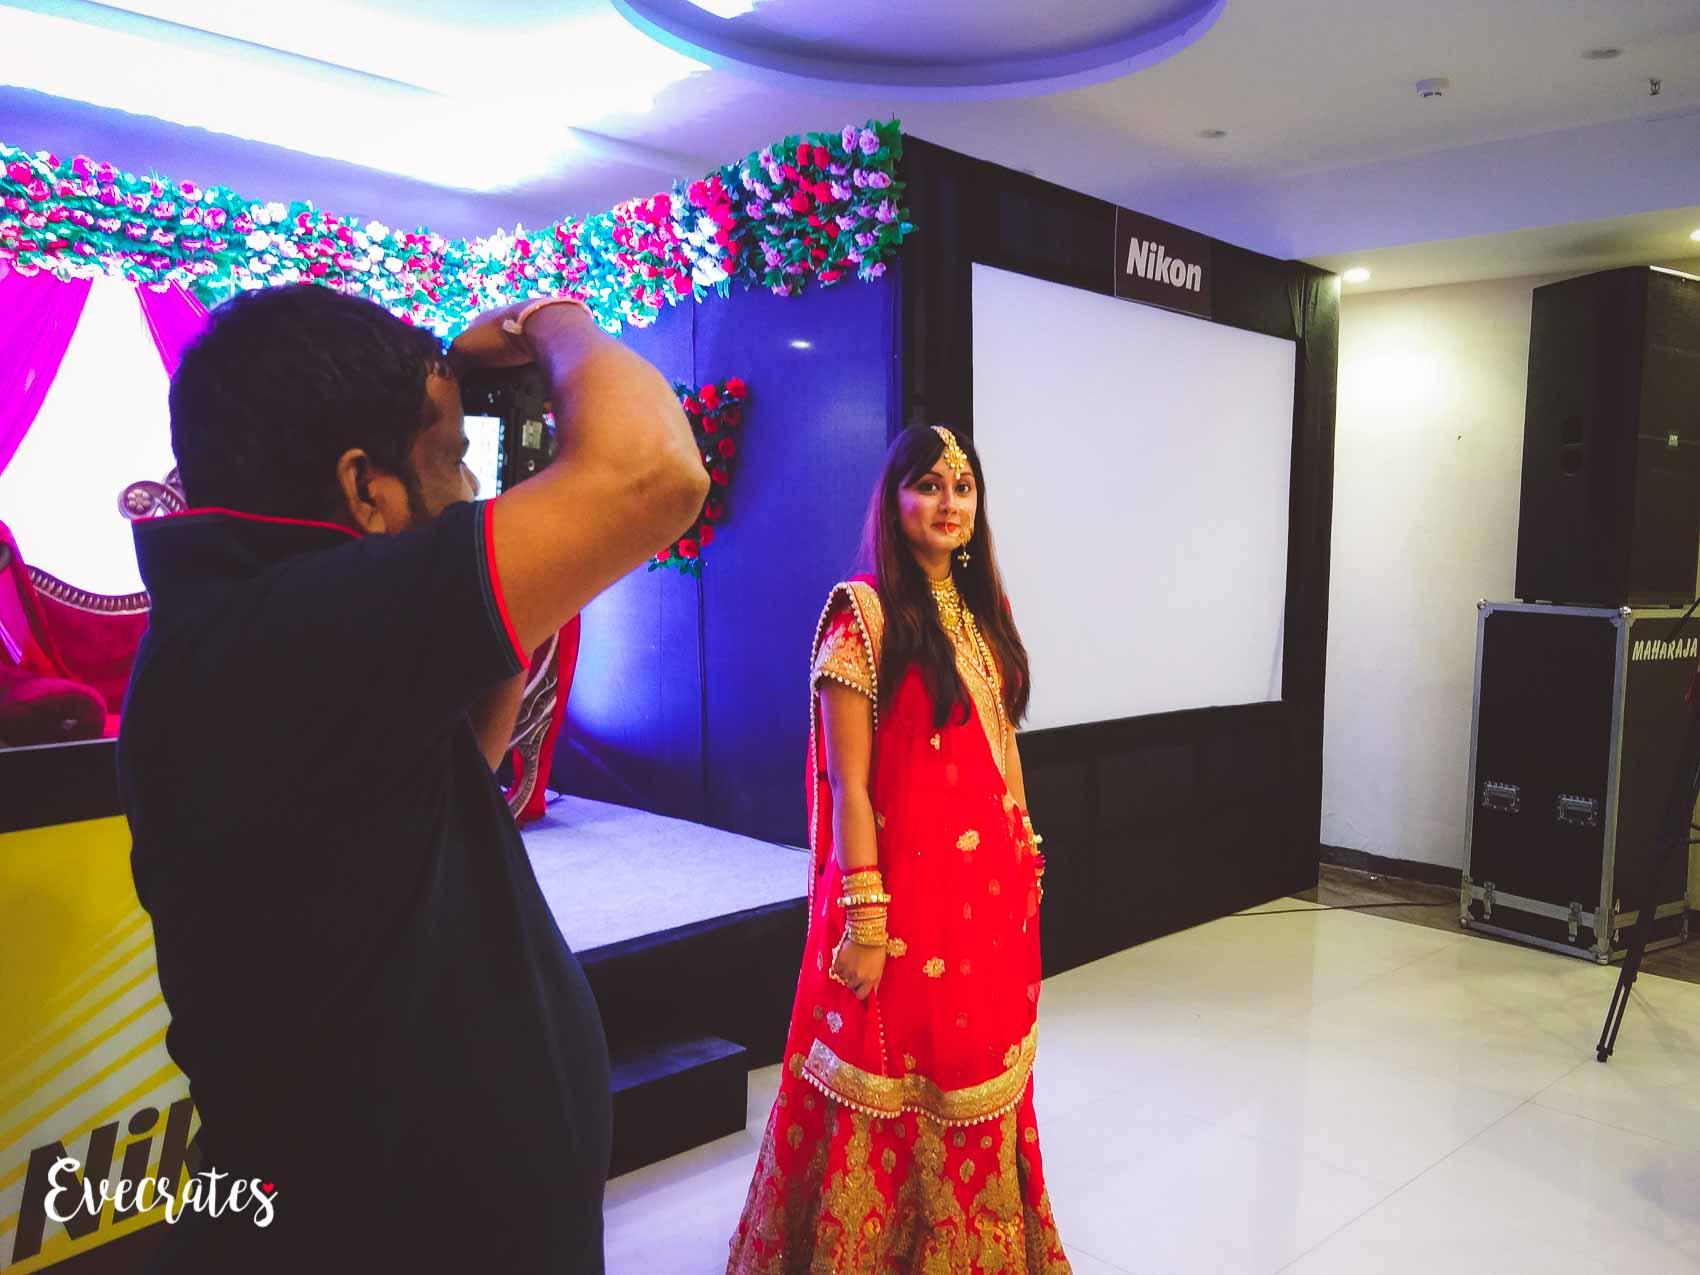 Nikon Wedding Photography: Nikon Wedding Photography Workshop 2017